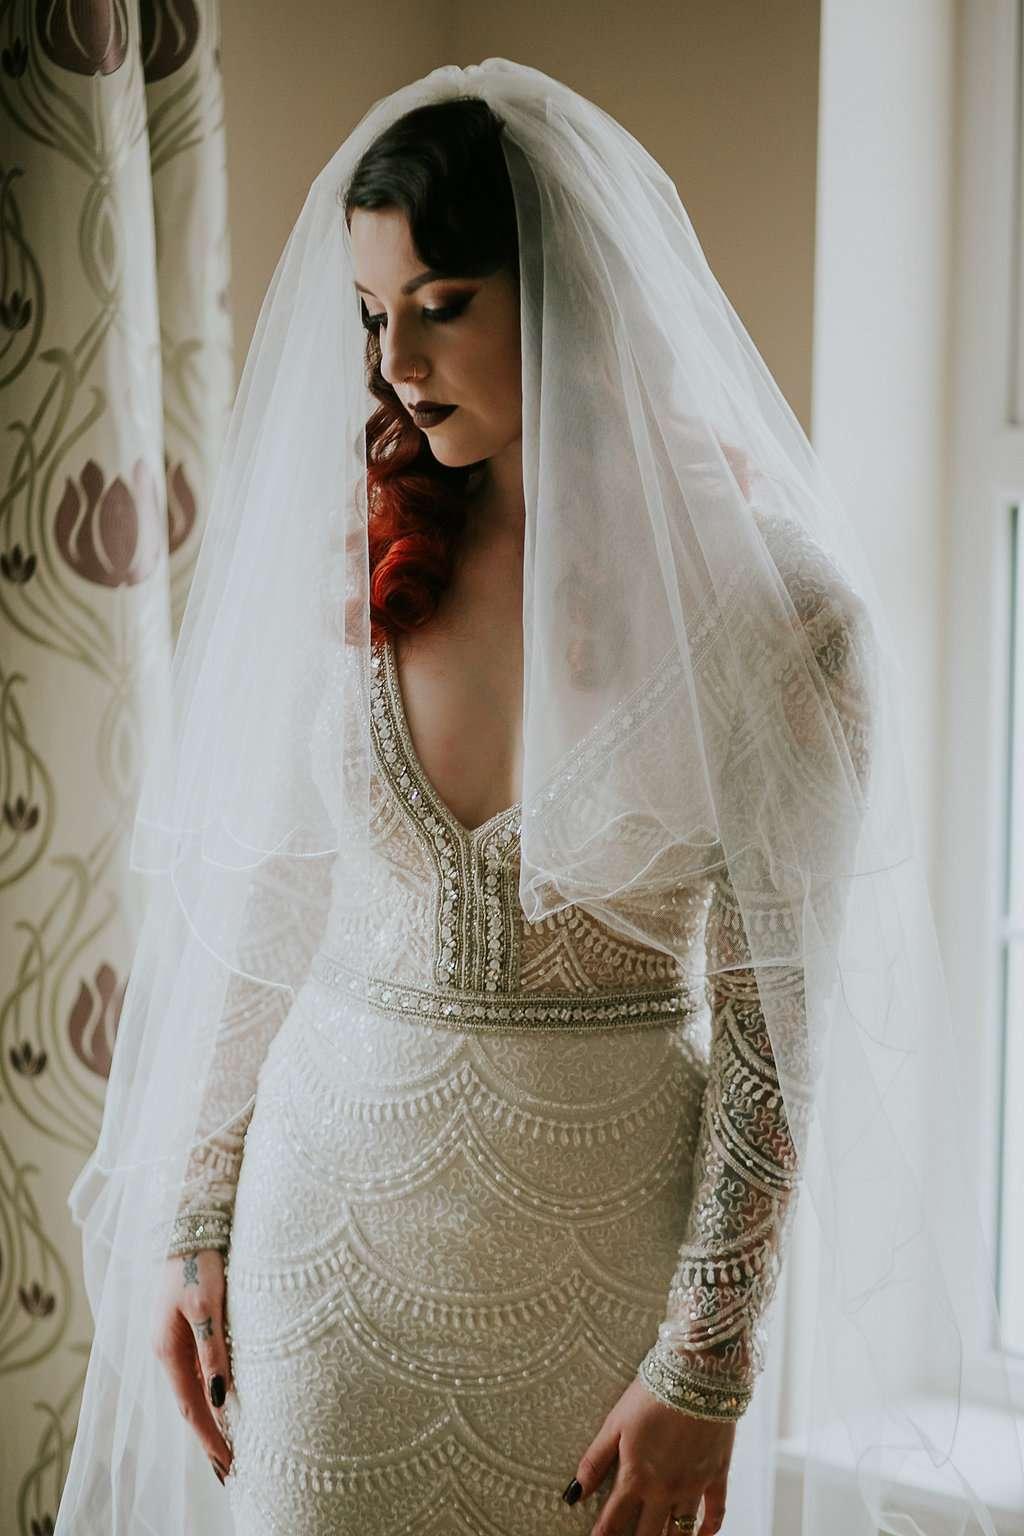 Wedding Dresses In Belfast 2 Luxury Glamorous Vaudeville Wedding in